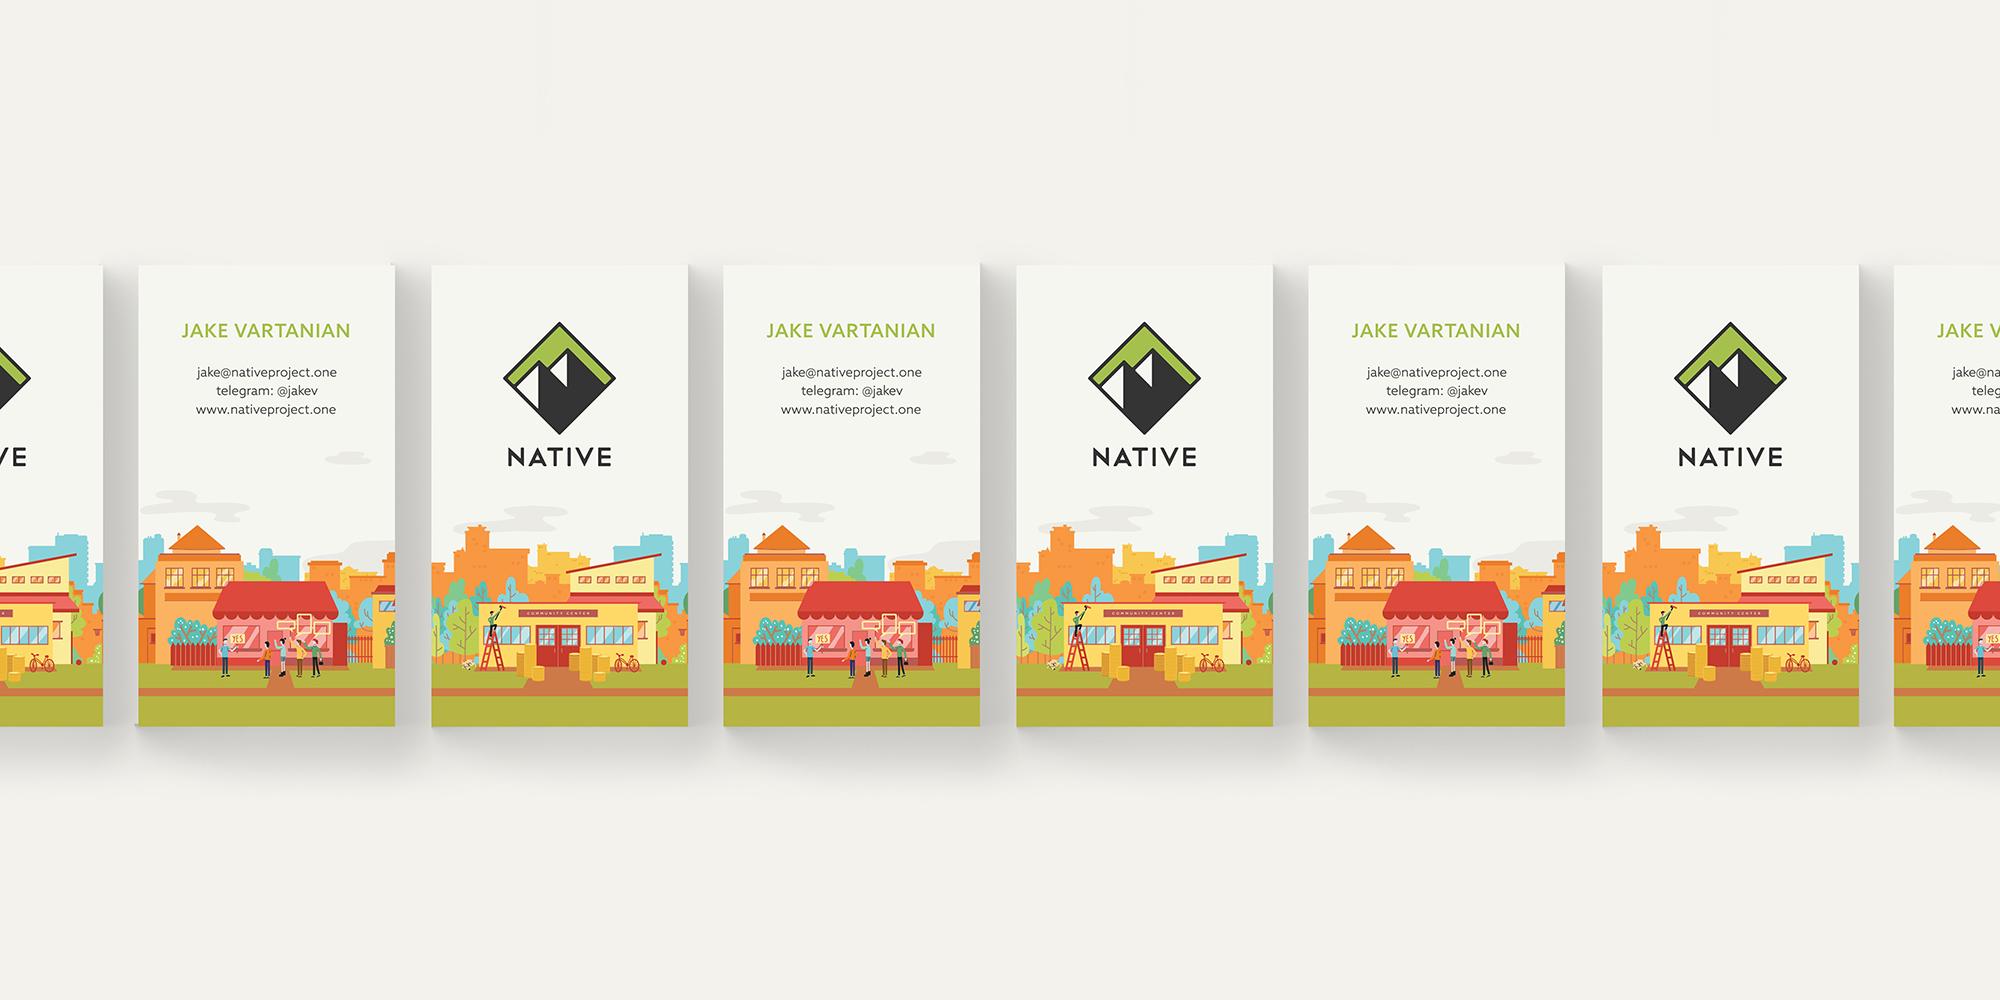 Native_brandidentity_businesscards_julieeckertdesign_11-4.jpg